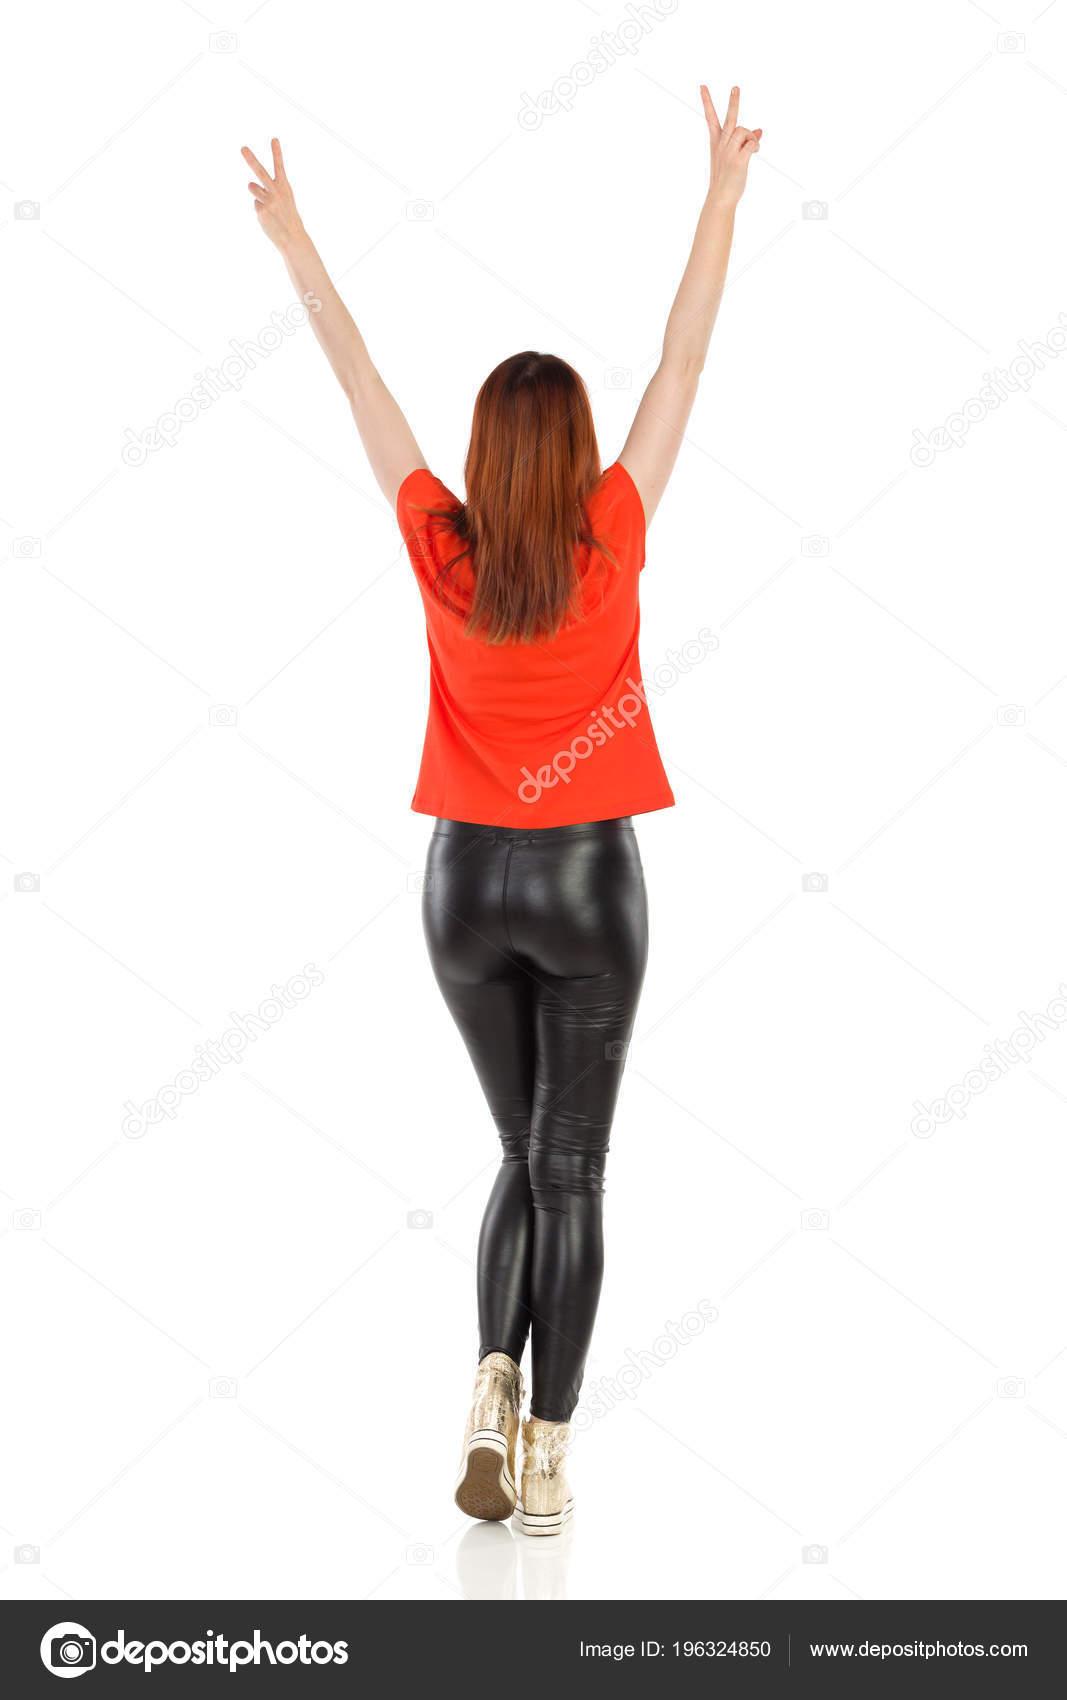 /Pantalones de tiro alto A-Express /®/ brillante aspecto mojado negro de piel sint/ética leggings de longitud completa